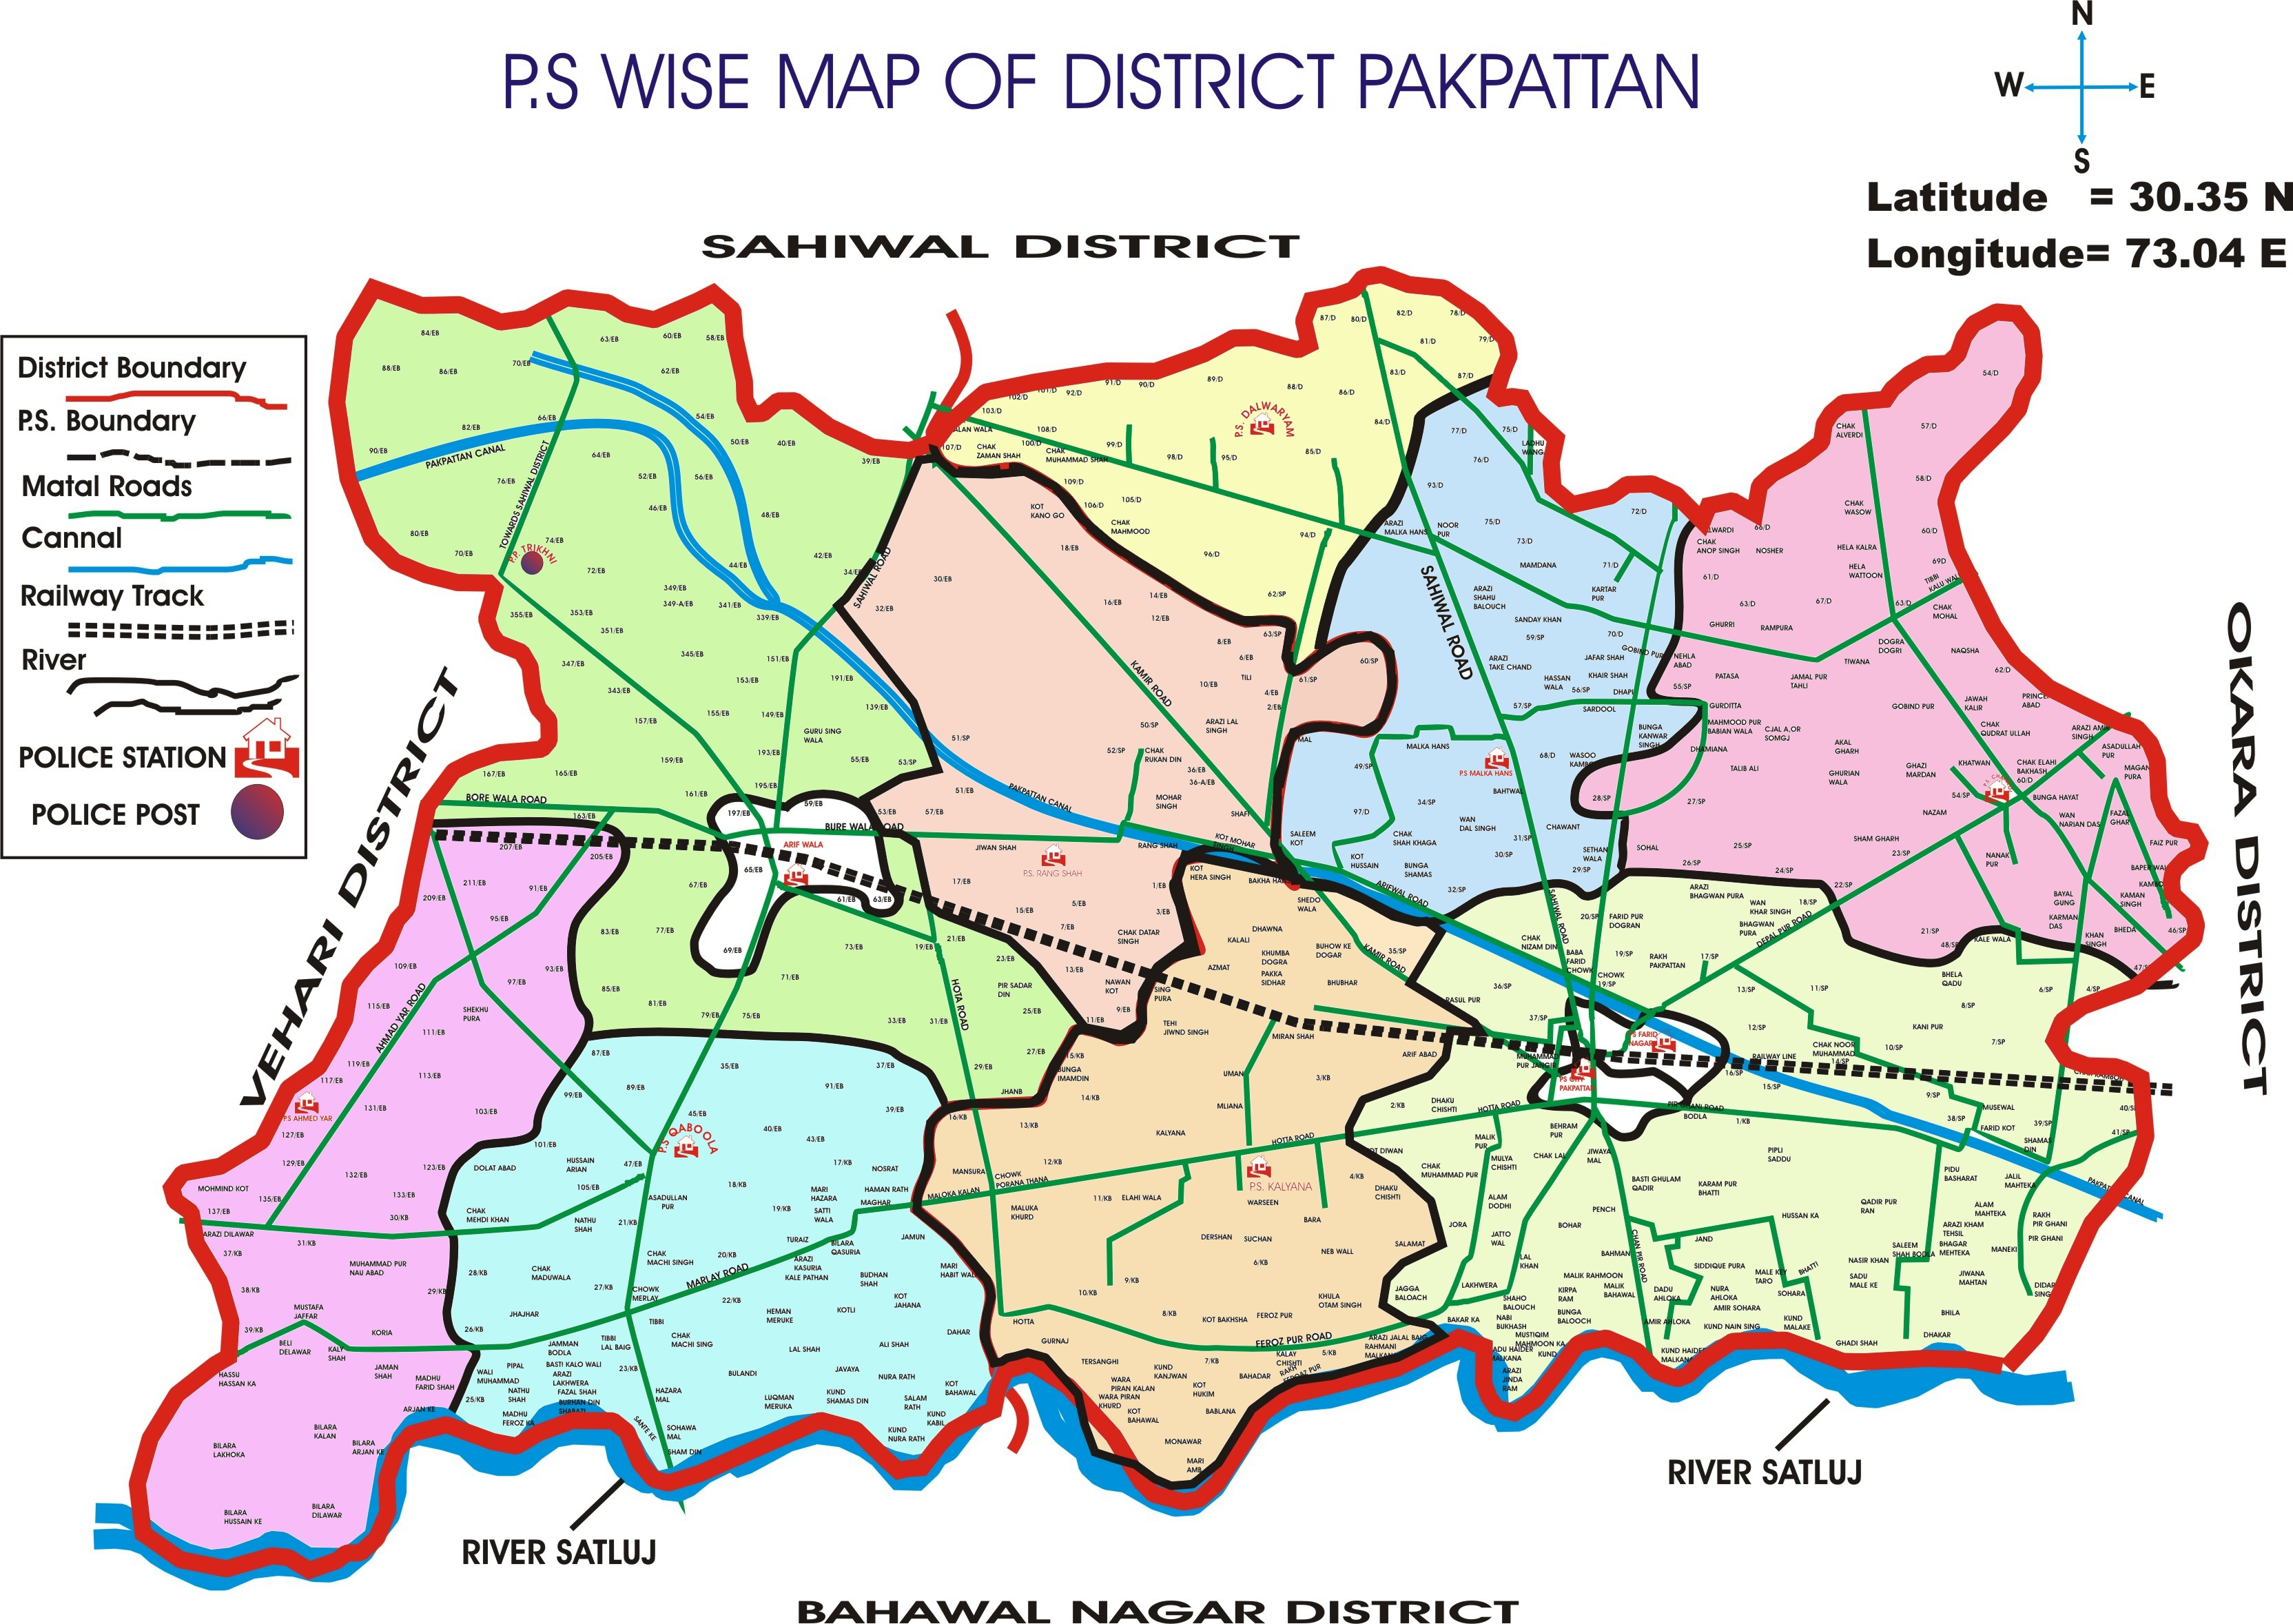 FilePakpattanmapjpg Wikimedia Commons - Pakpattan map